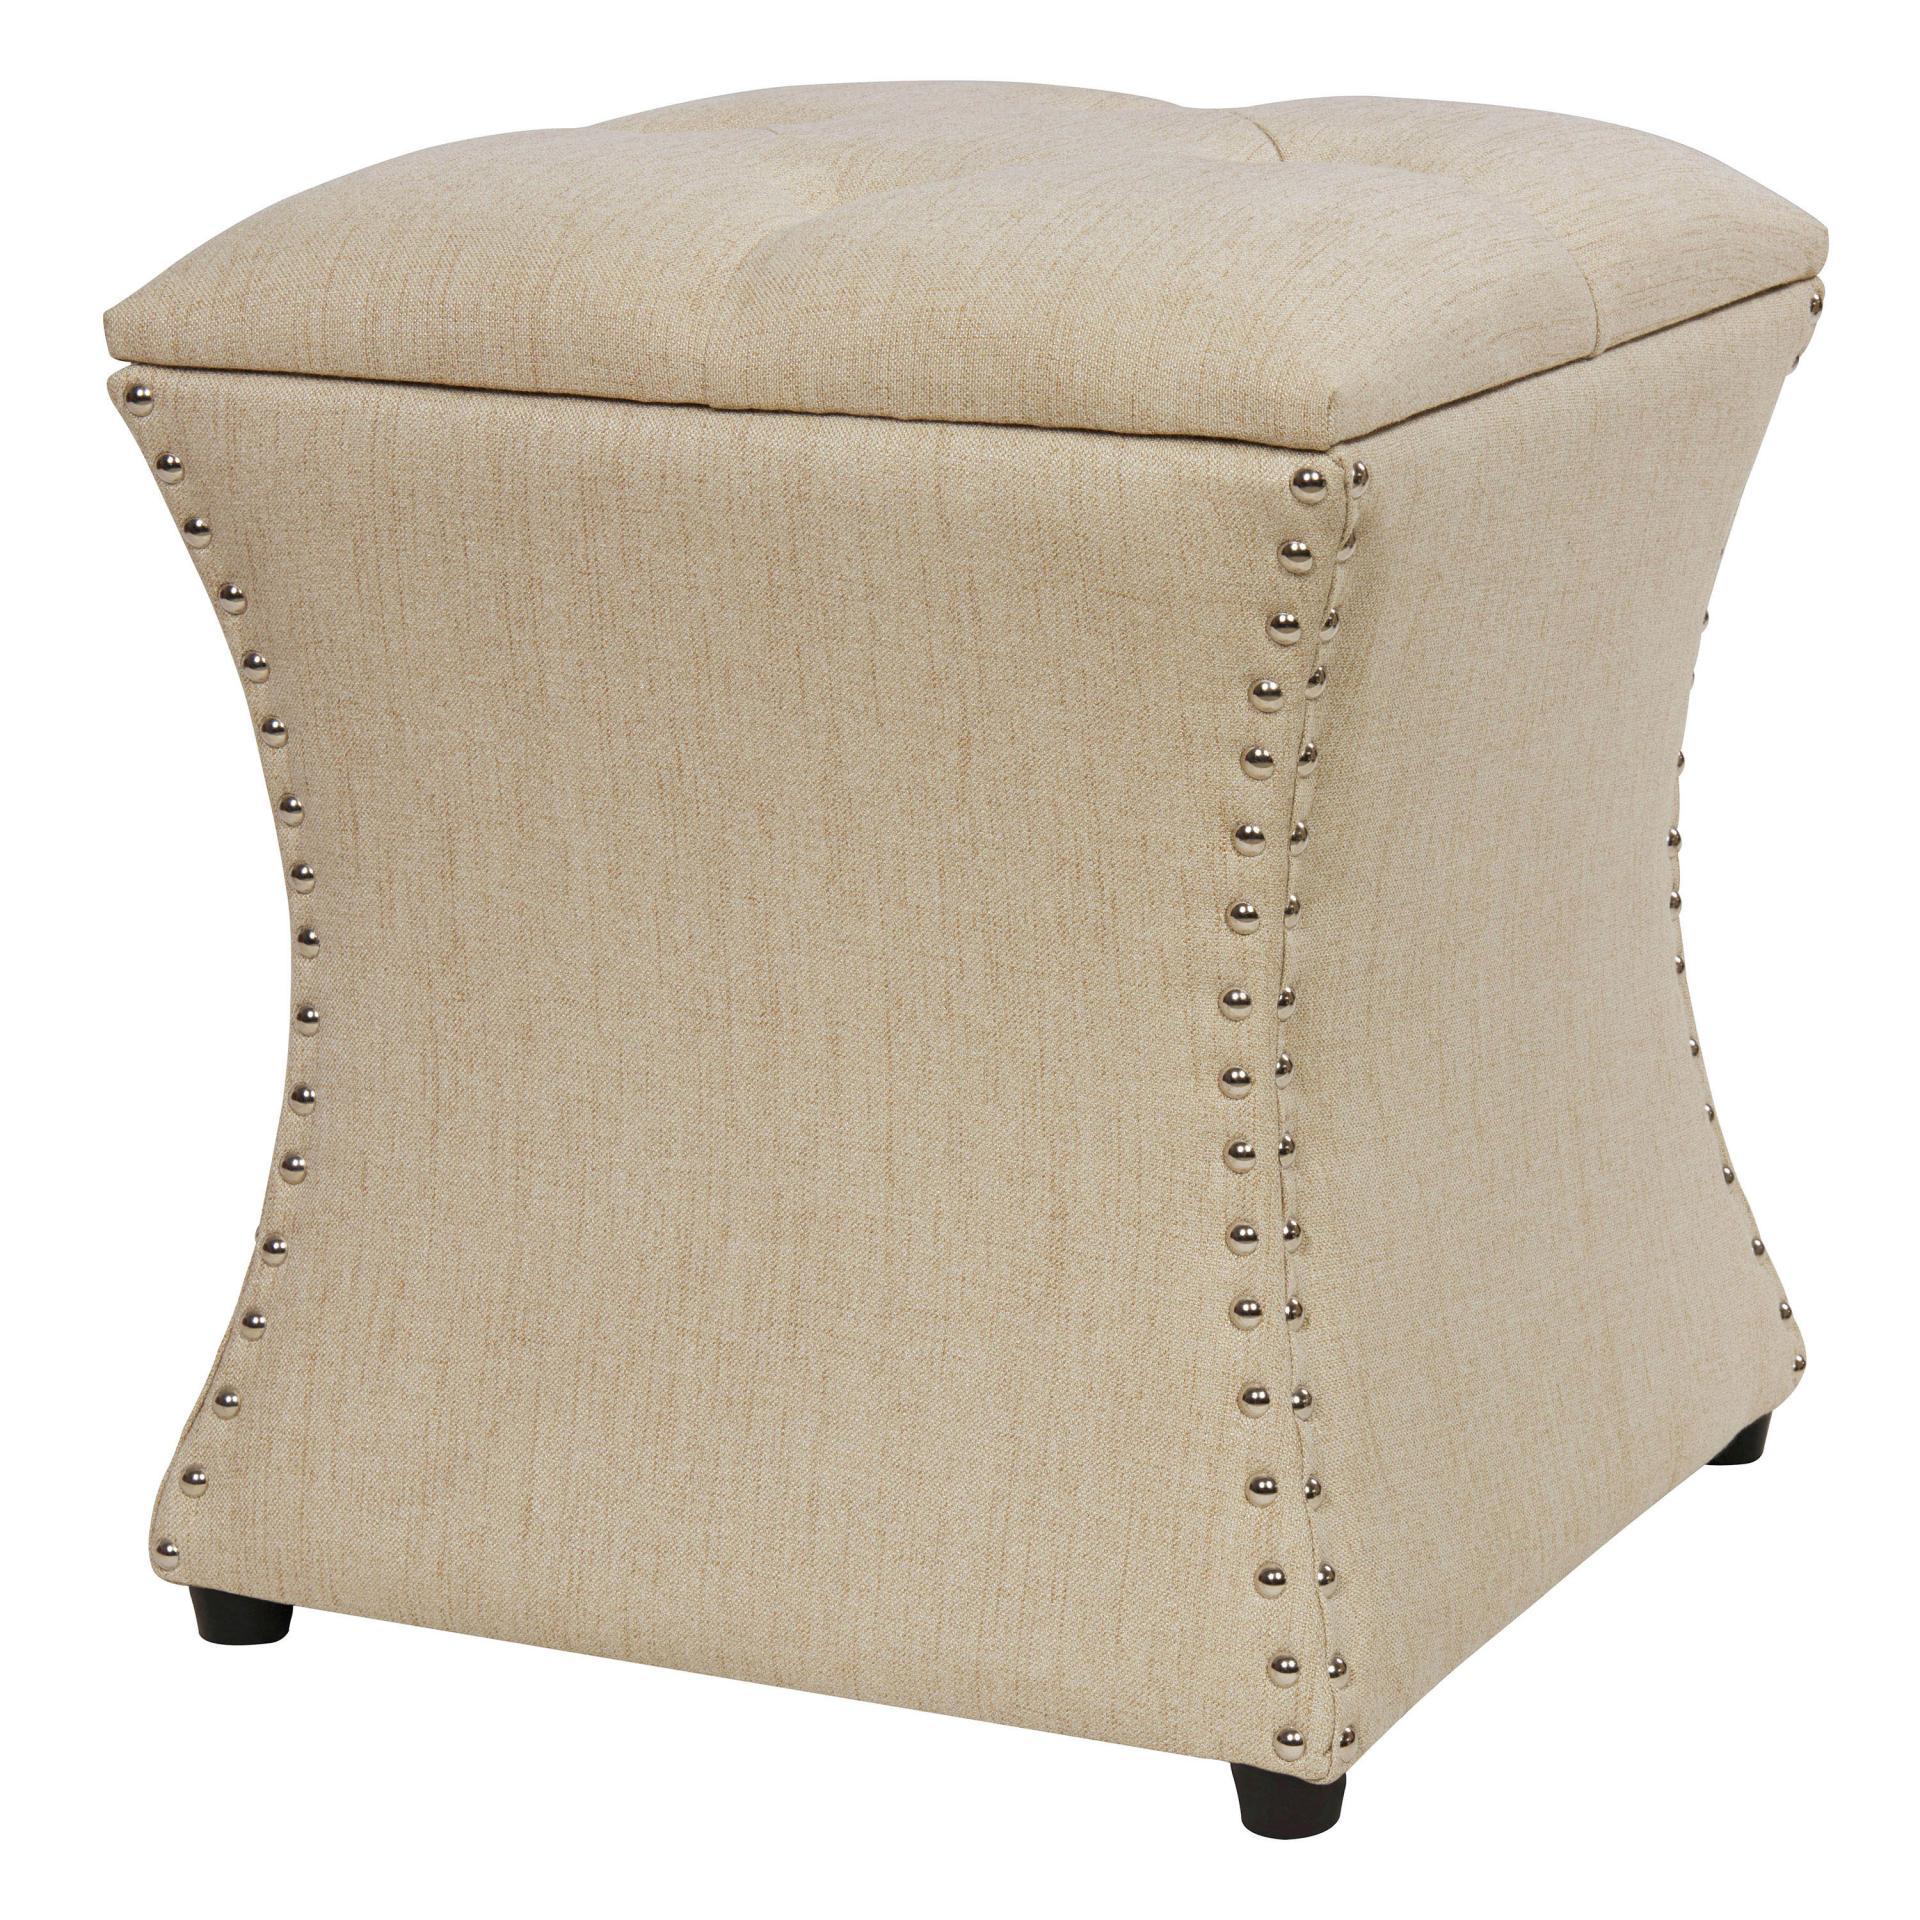 193619 19 Npd Home Furniture Wholesale Lifestyle